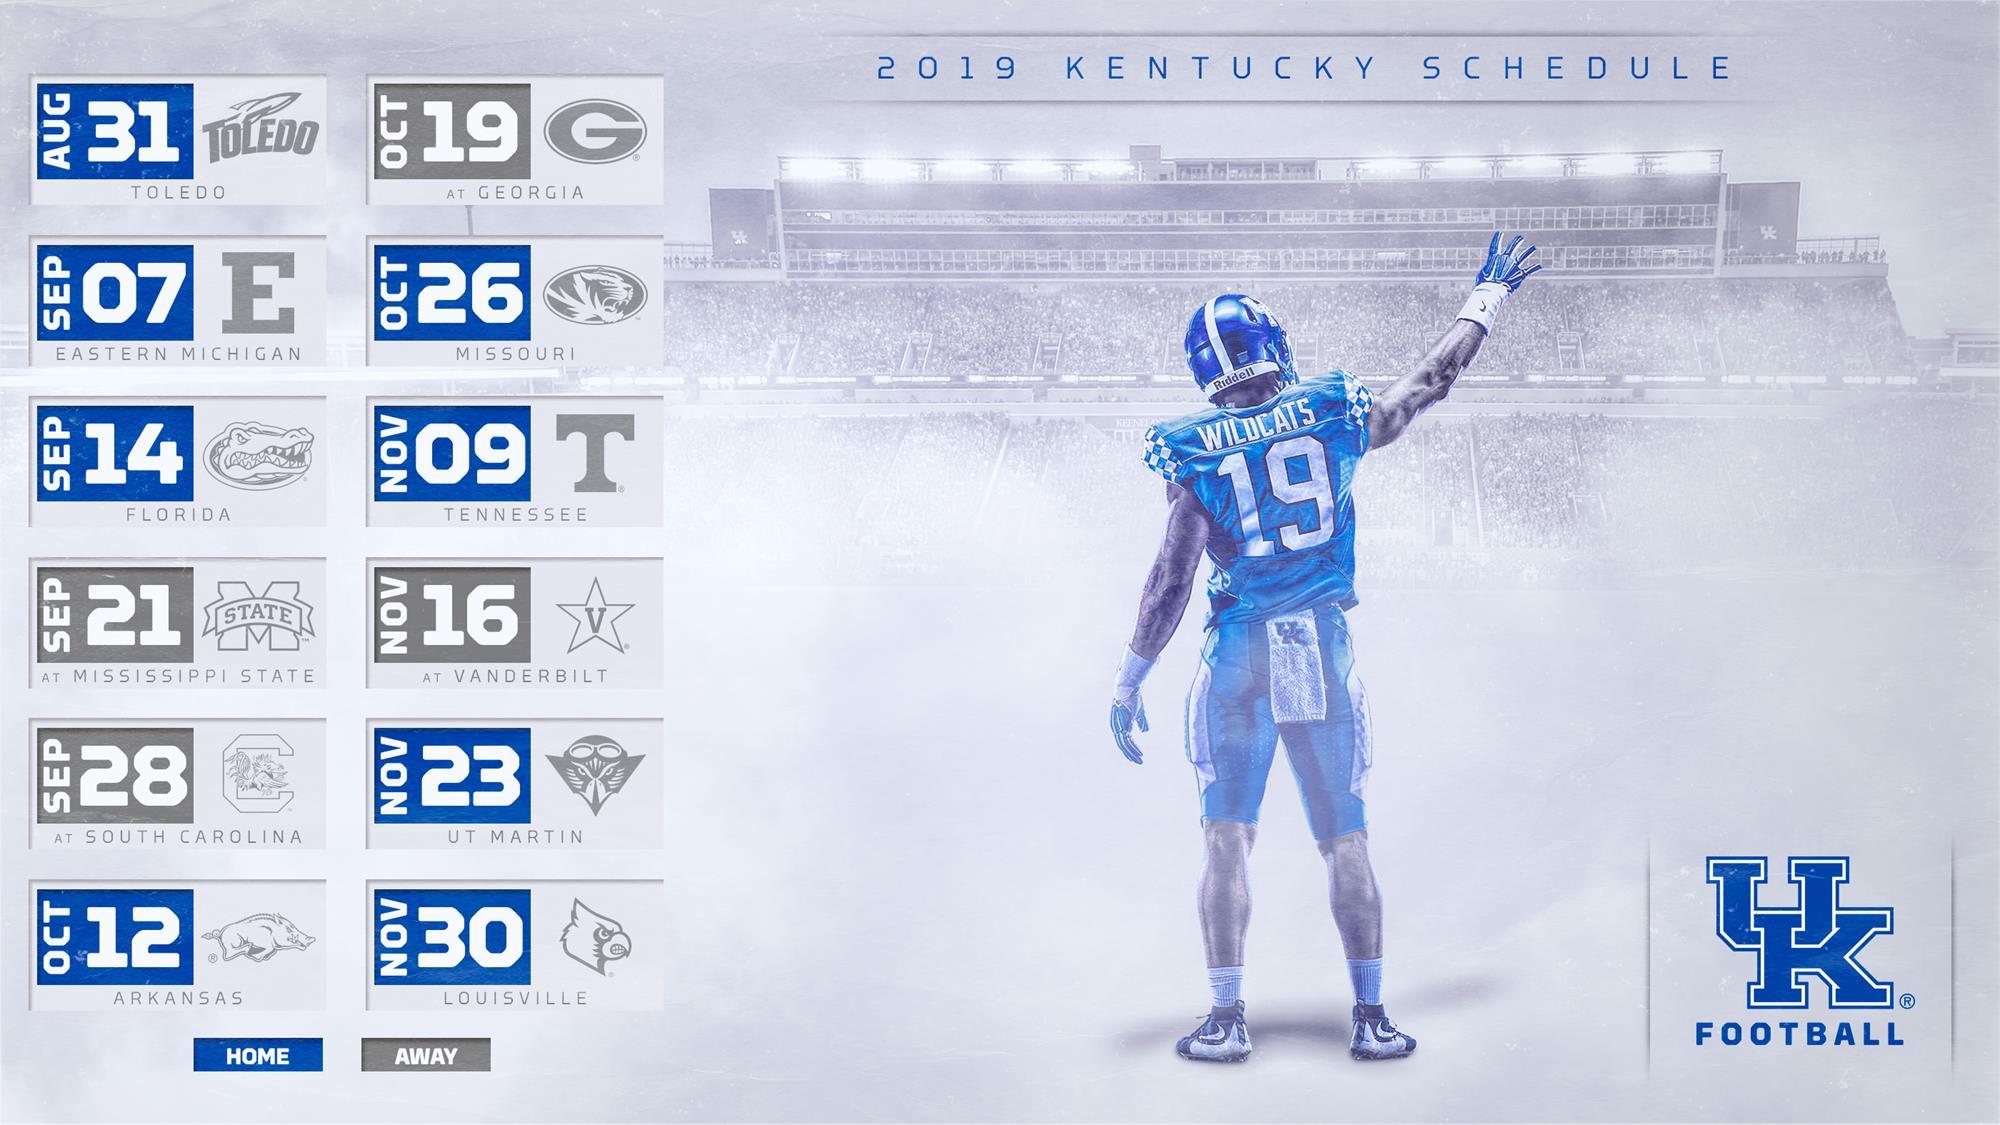 Uk Men S Basketball 2018 2019 Schedule: Kentucky Set For Home-Heavy 2019 Football Schedule